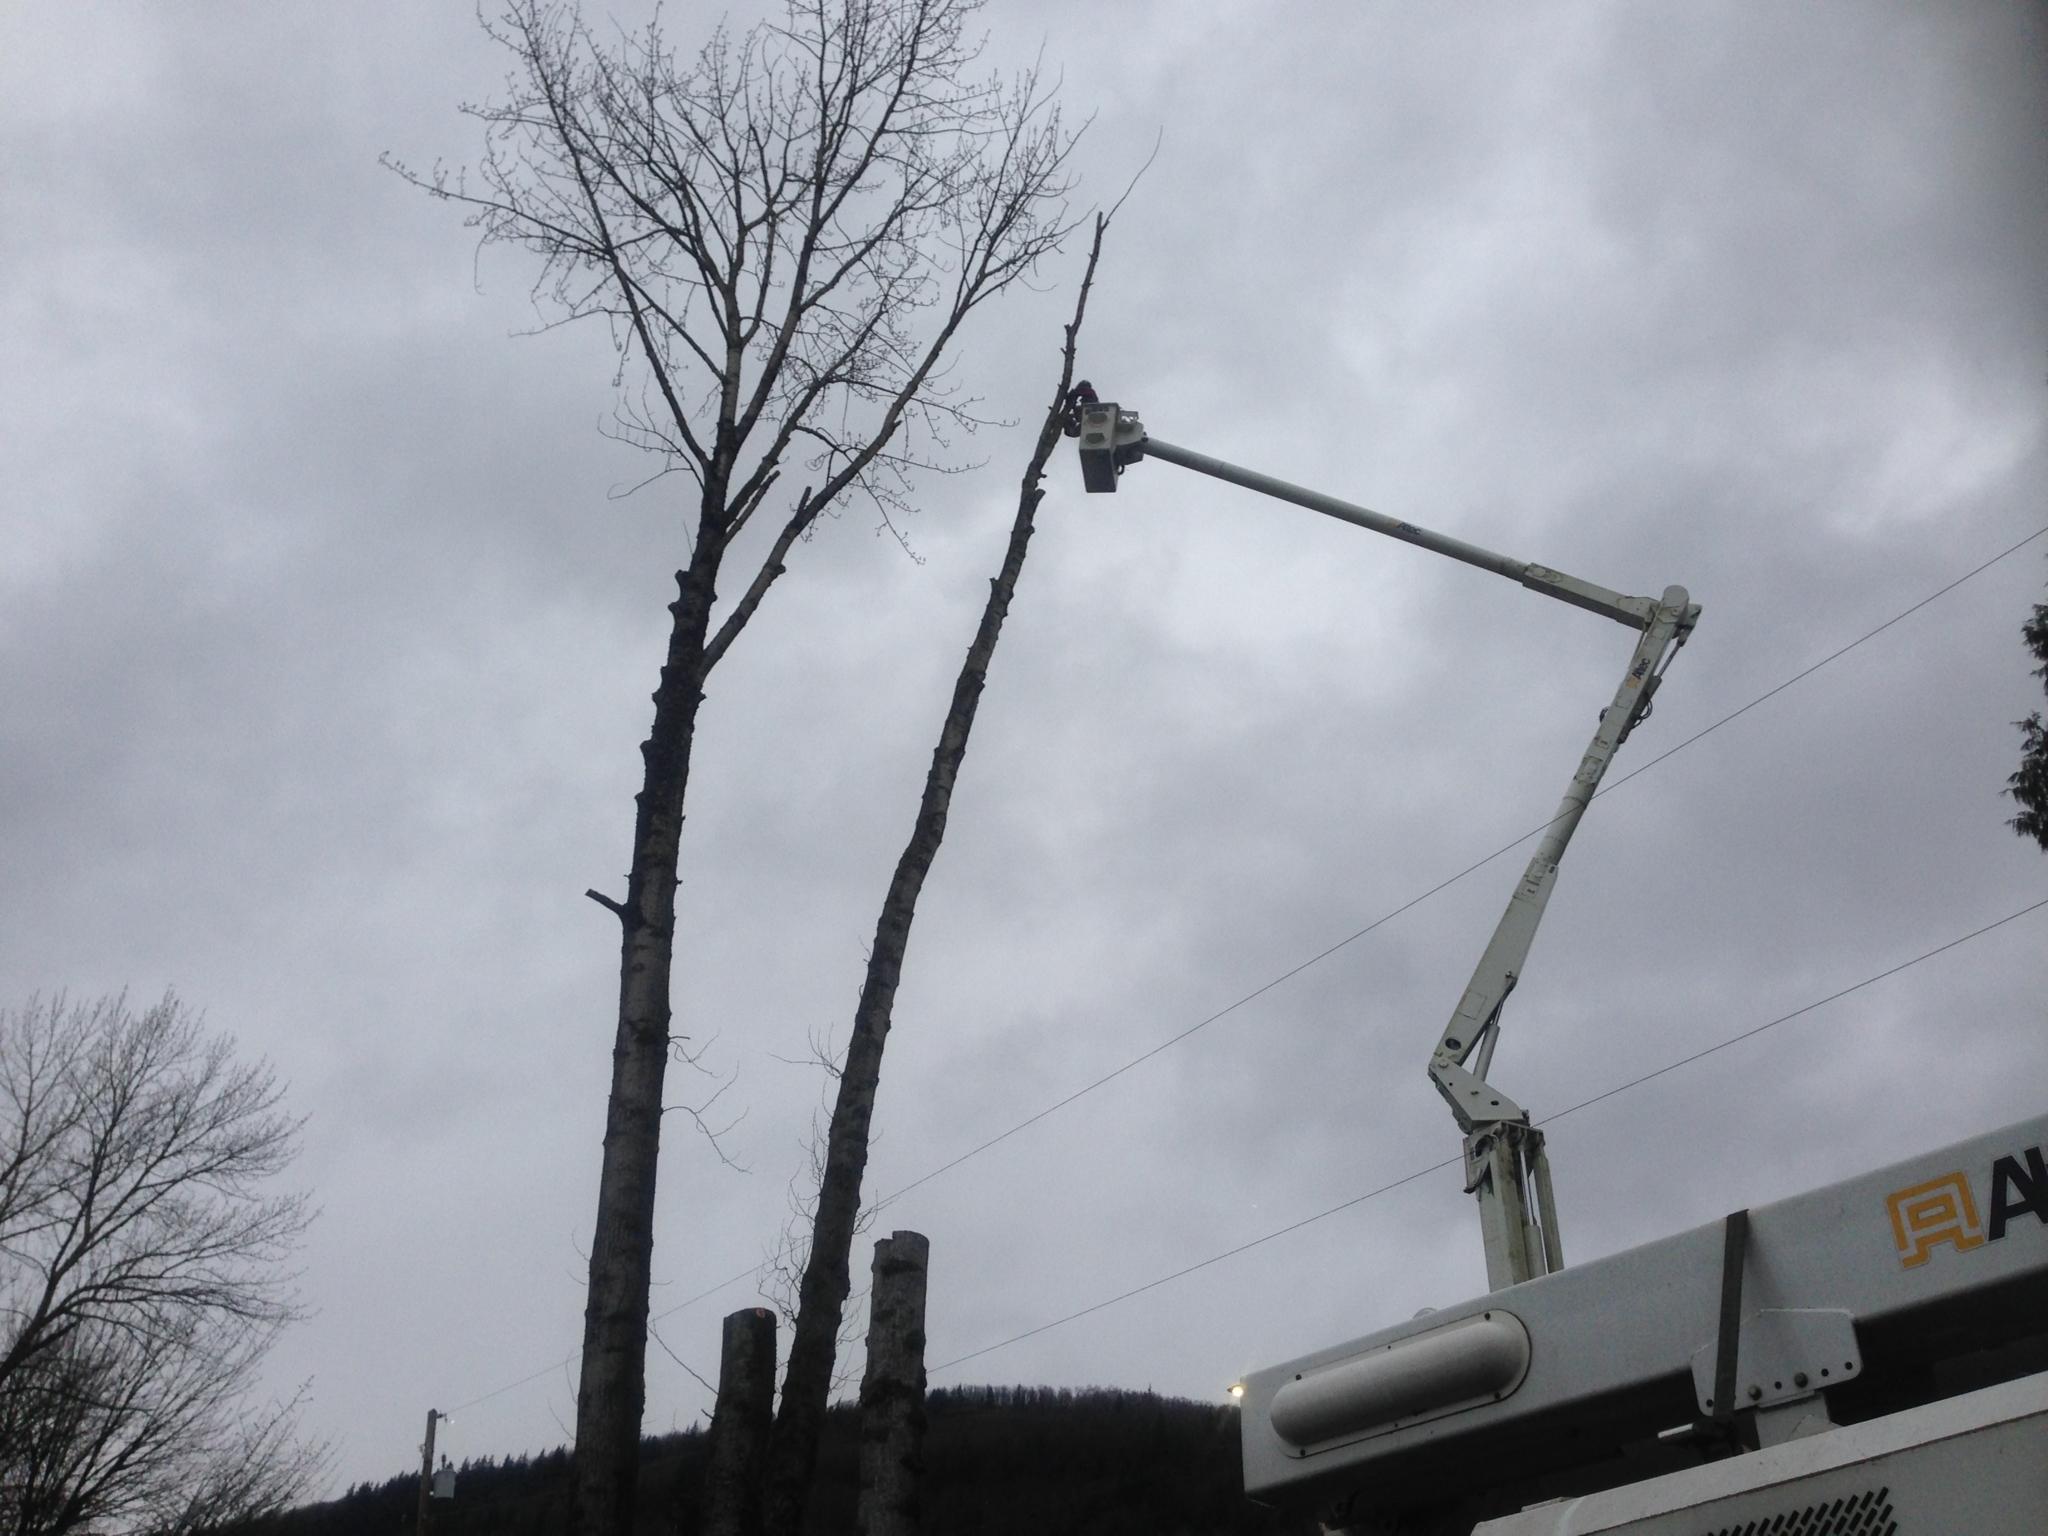 Highland Tree Service Ltd in Abbotsford